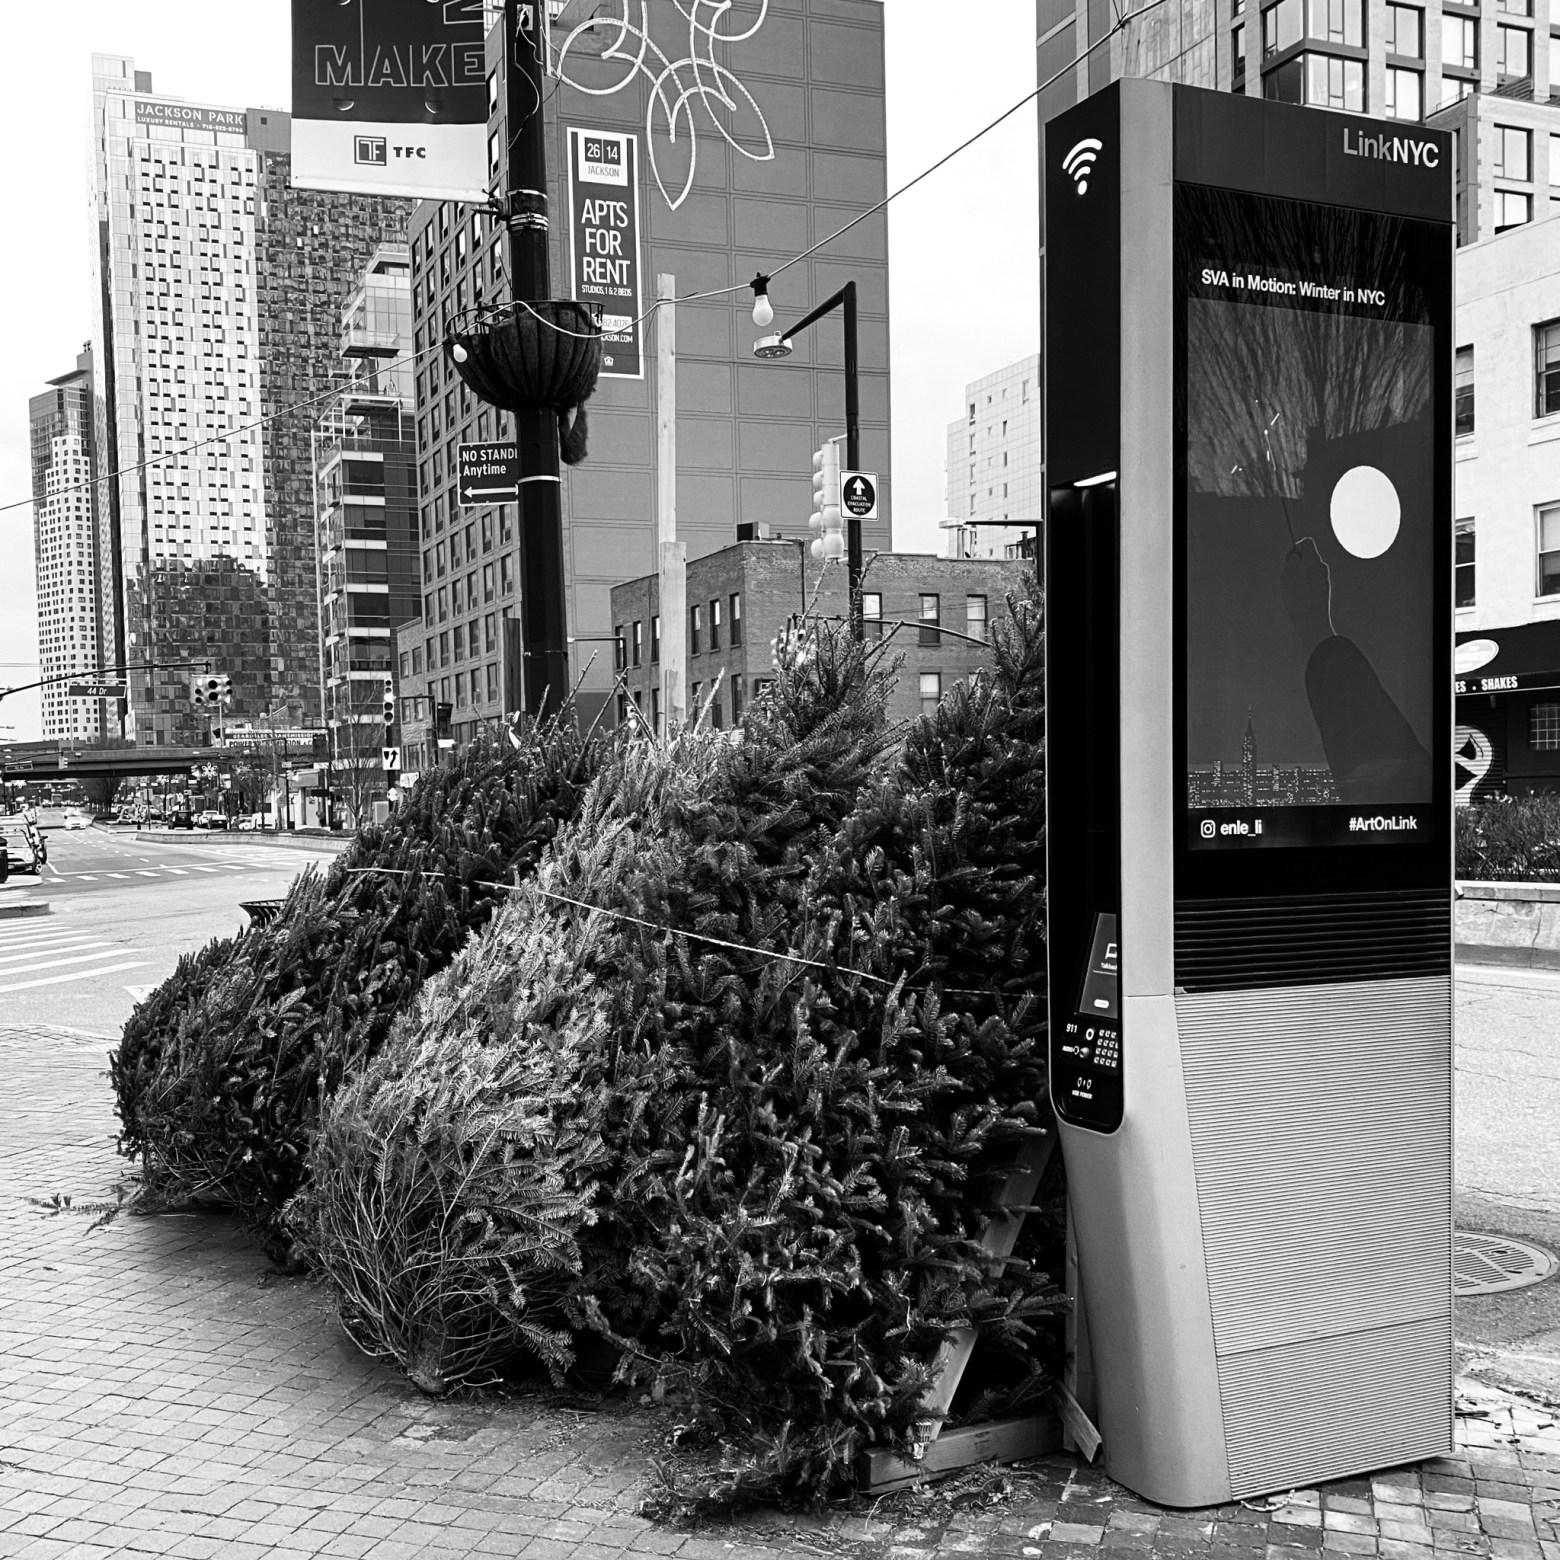 Christmas Trees & LinkNYC